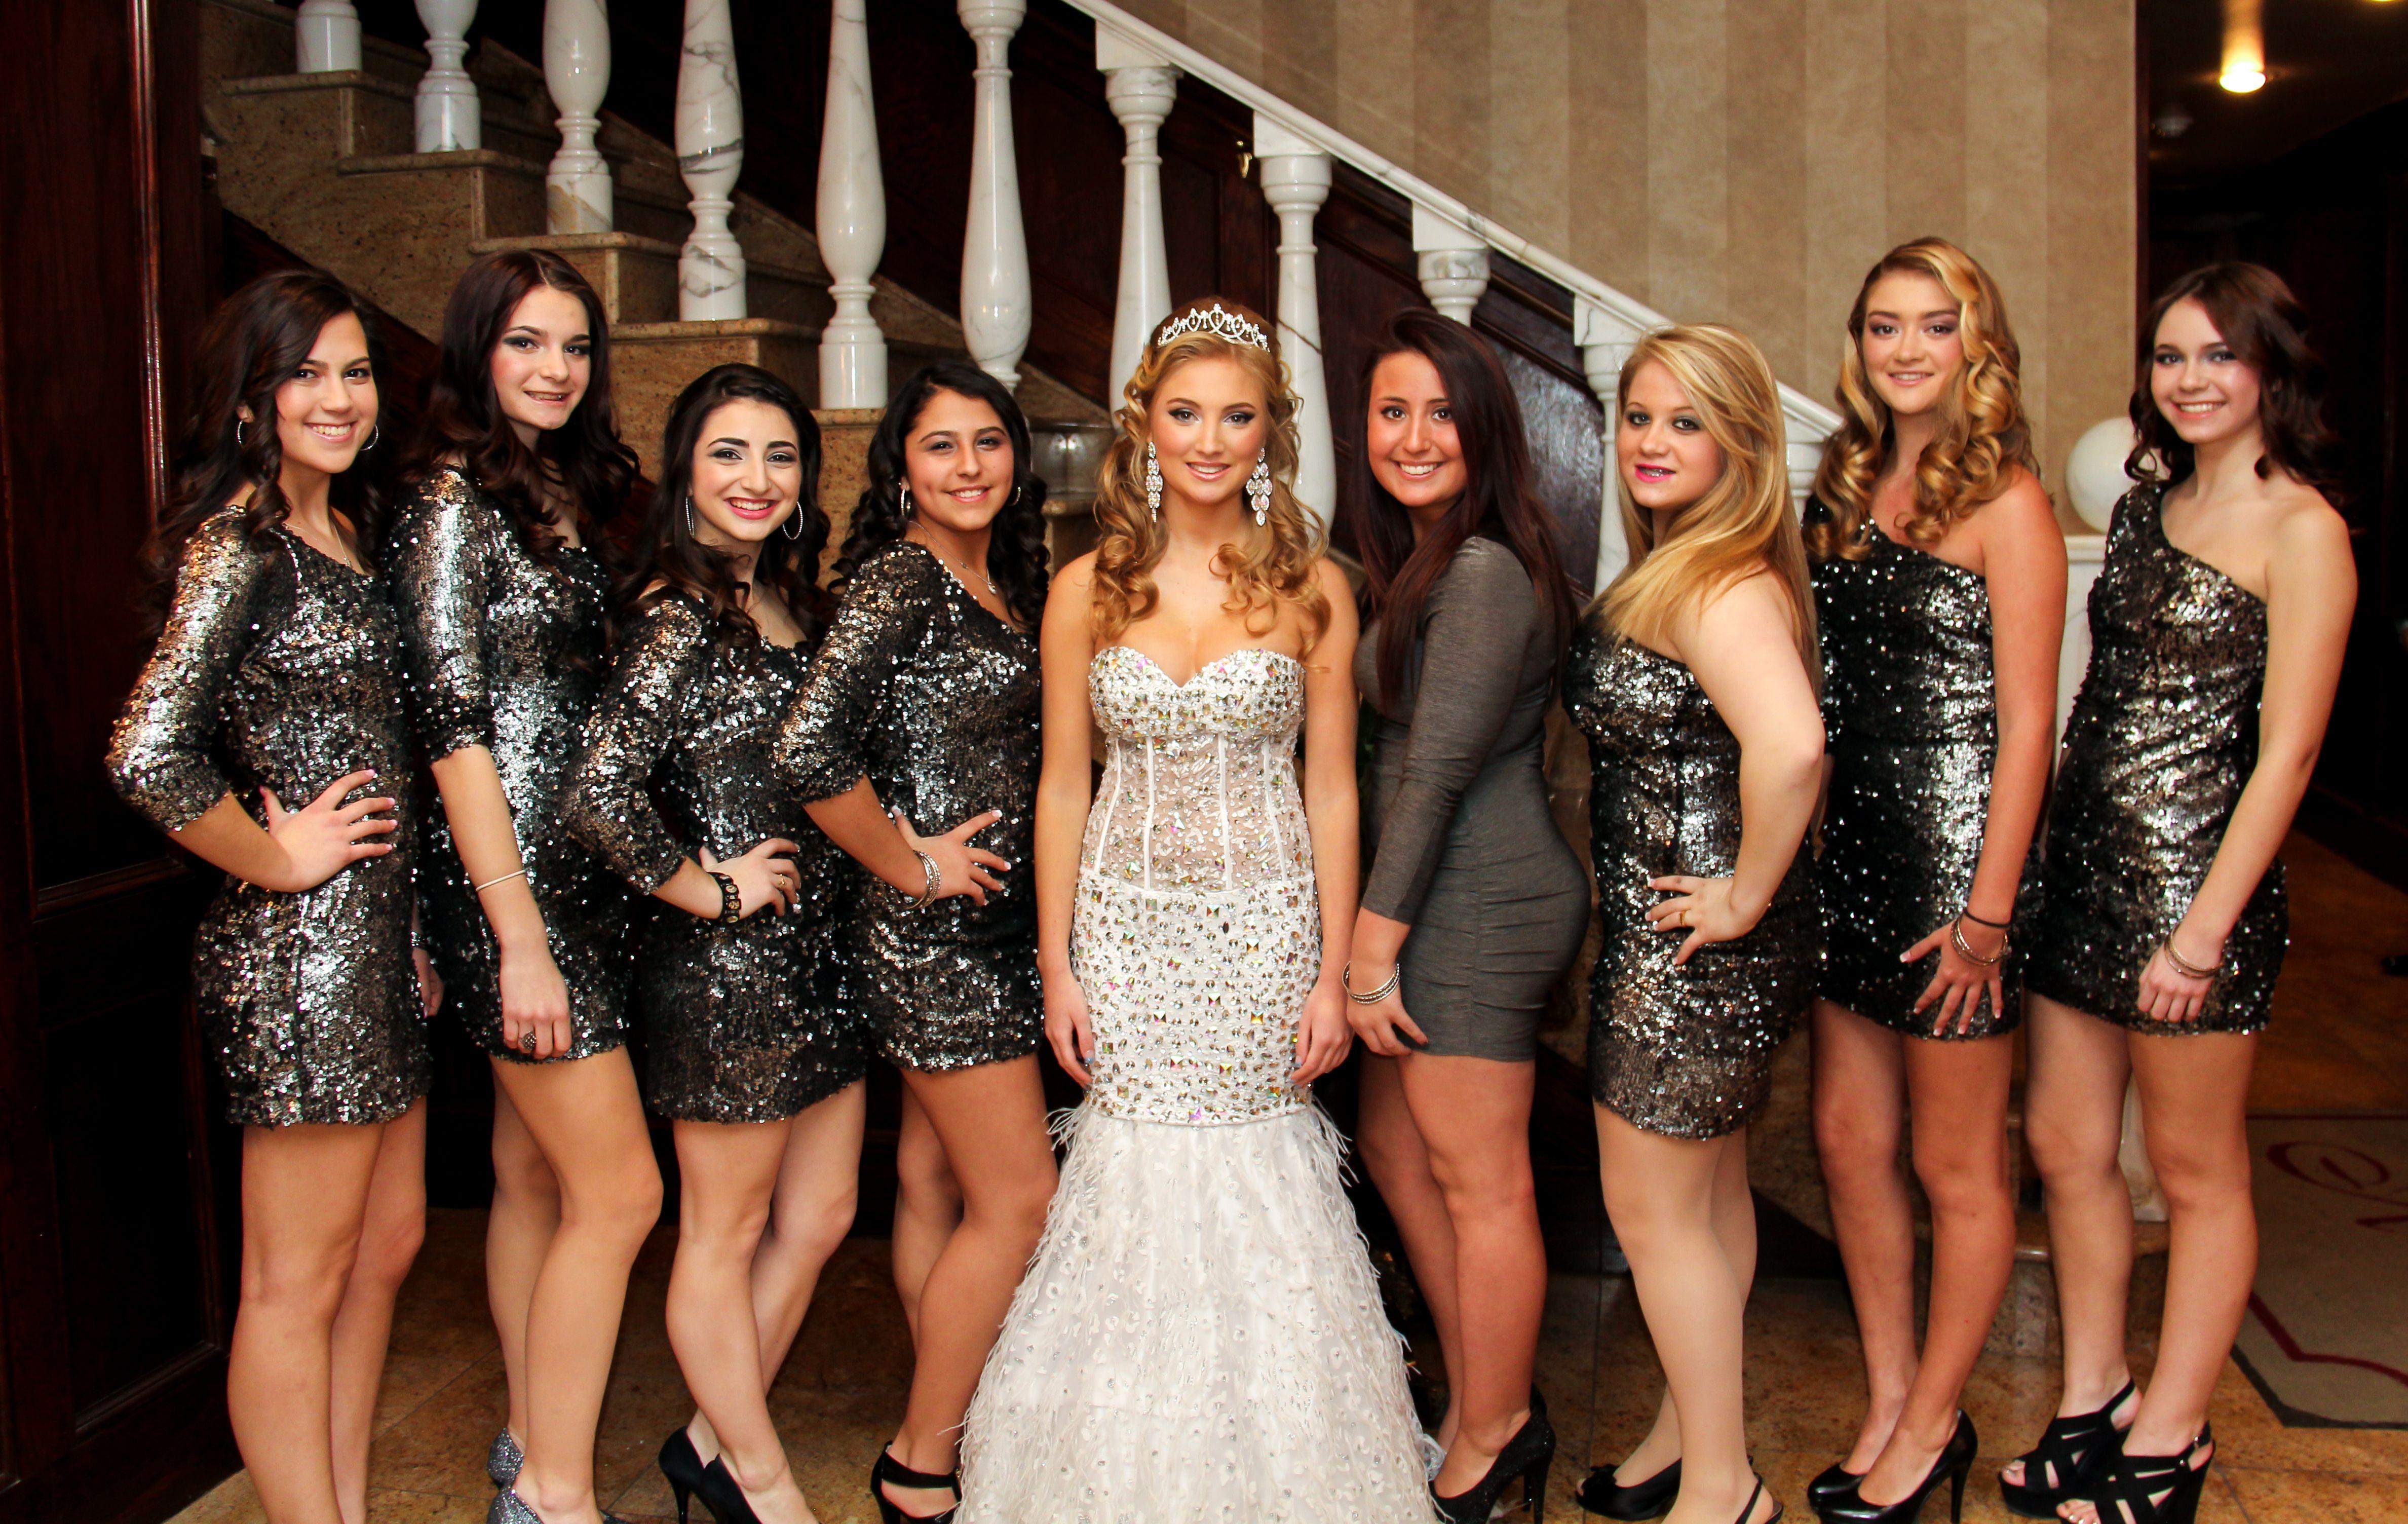 girls-club-prom-girls-galleries-toplesz-emo